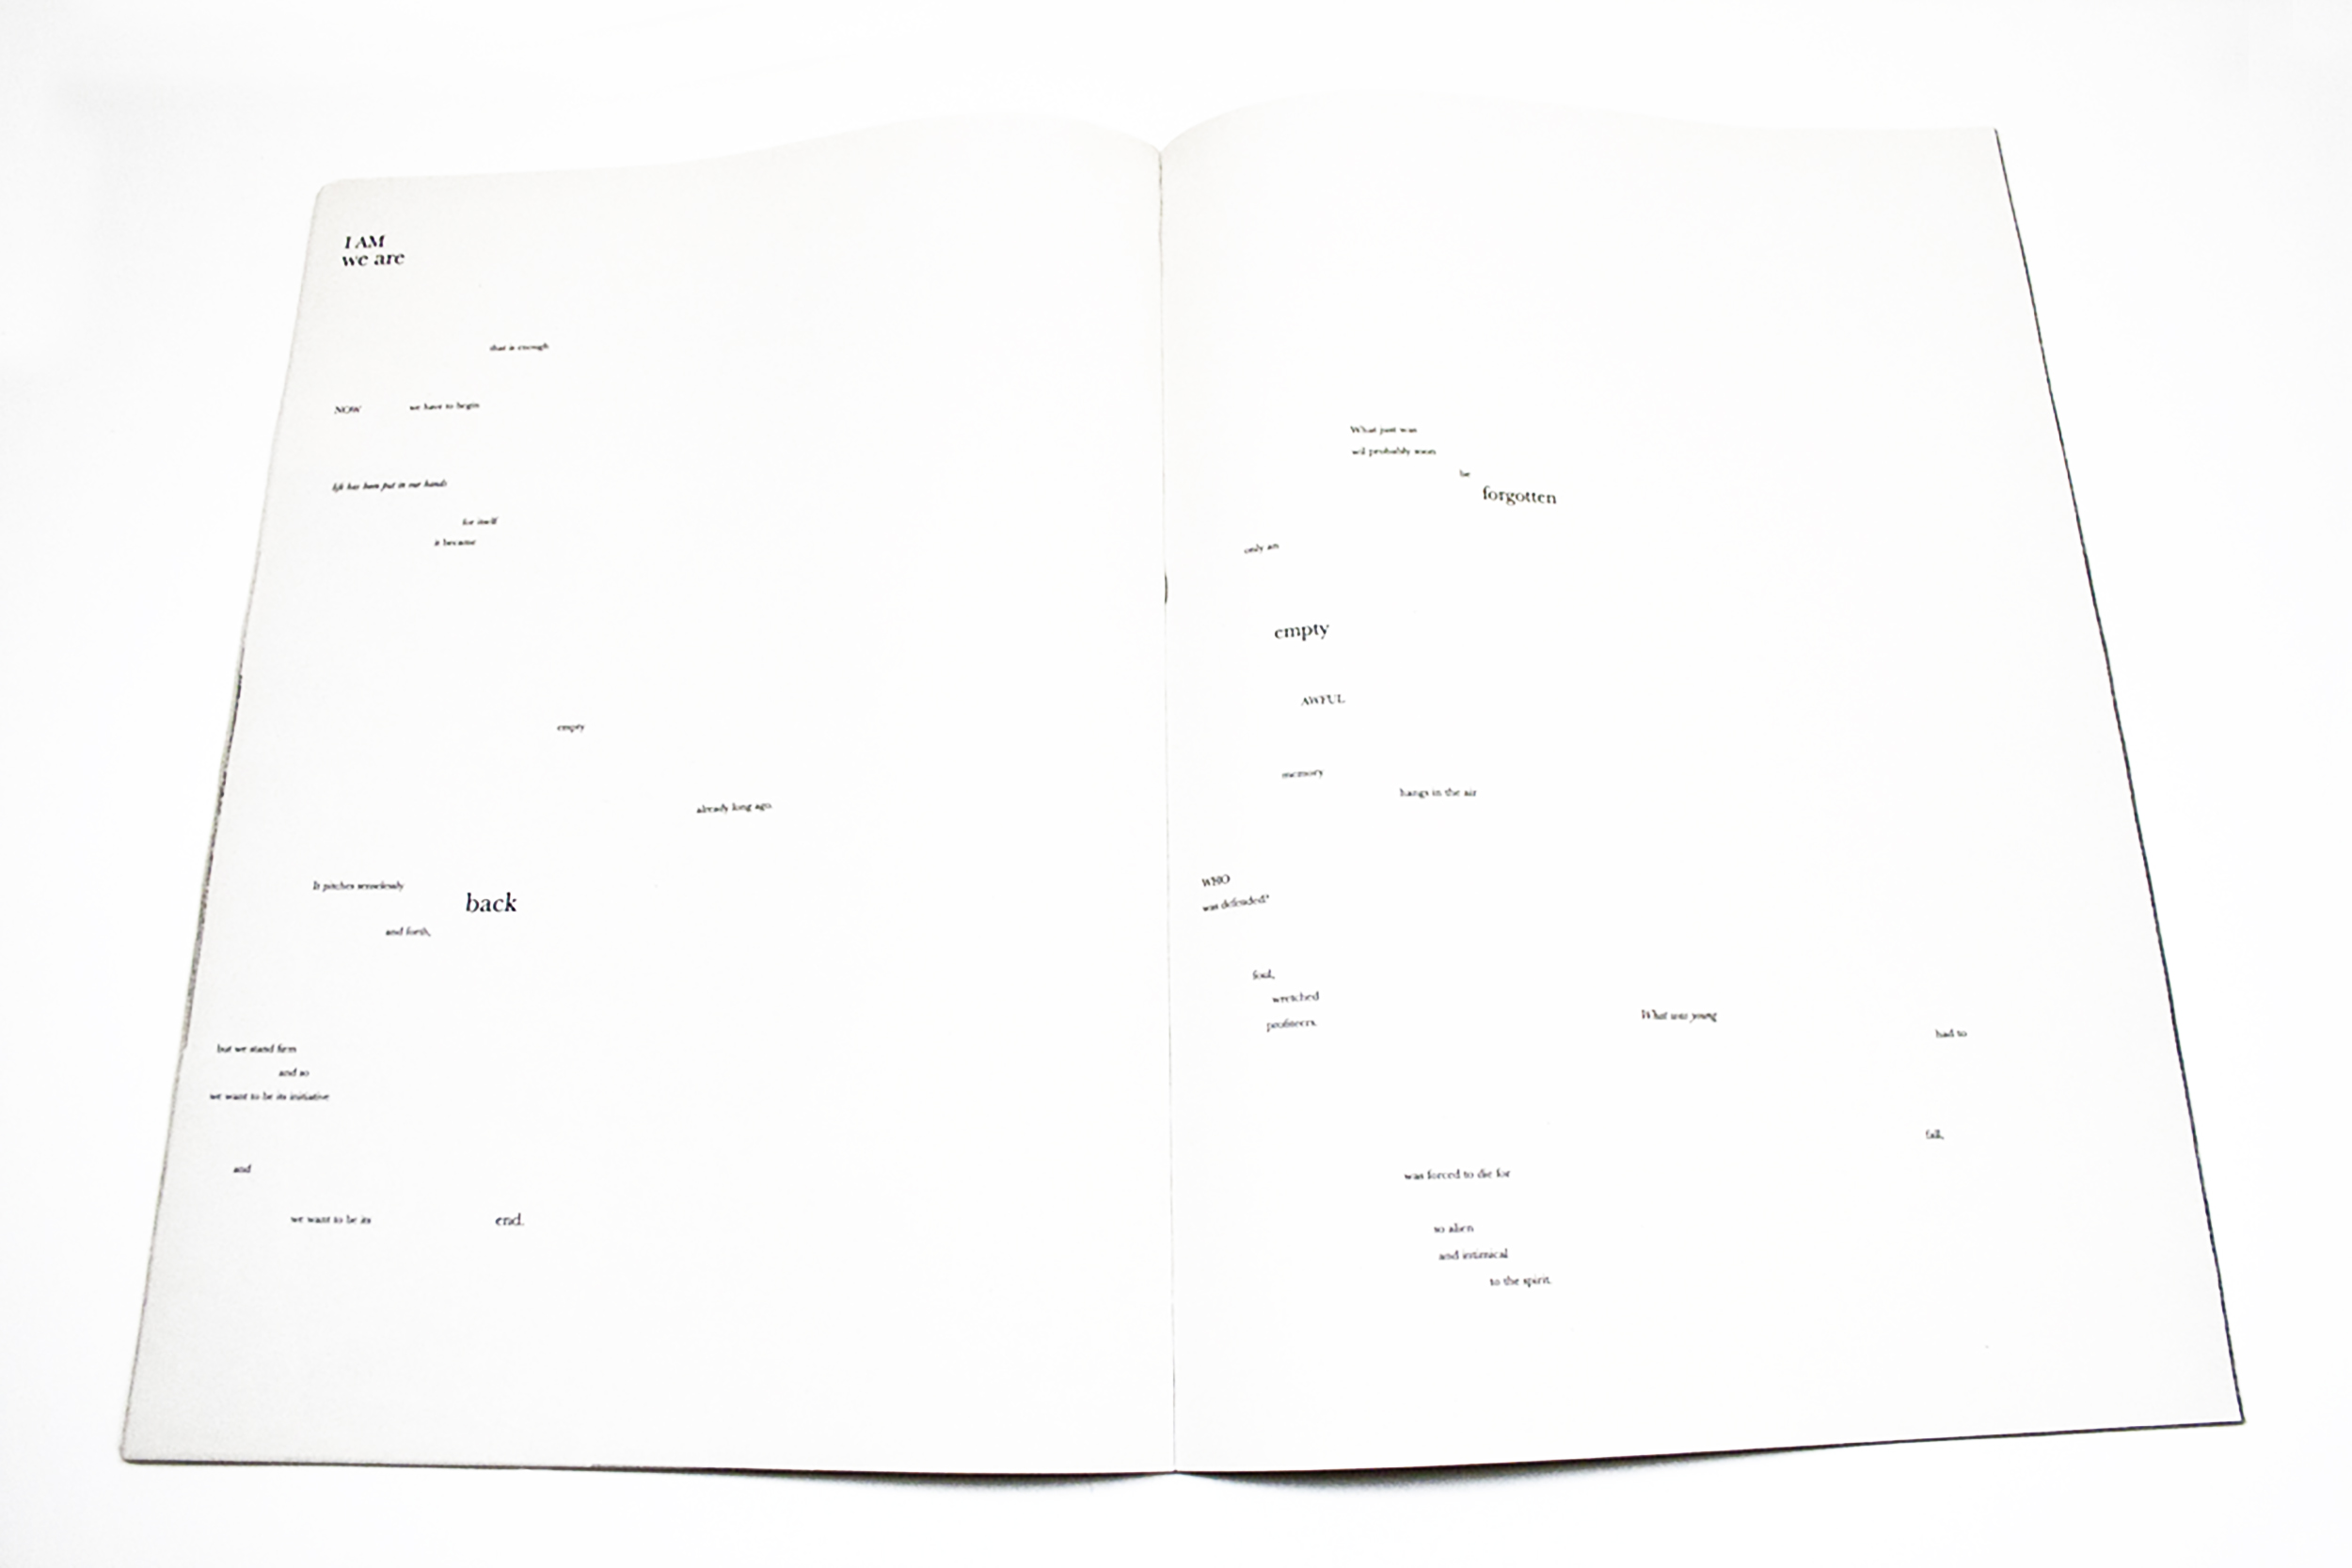 FARADAY_book_typographic-poem.jpg